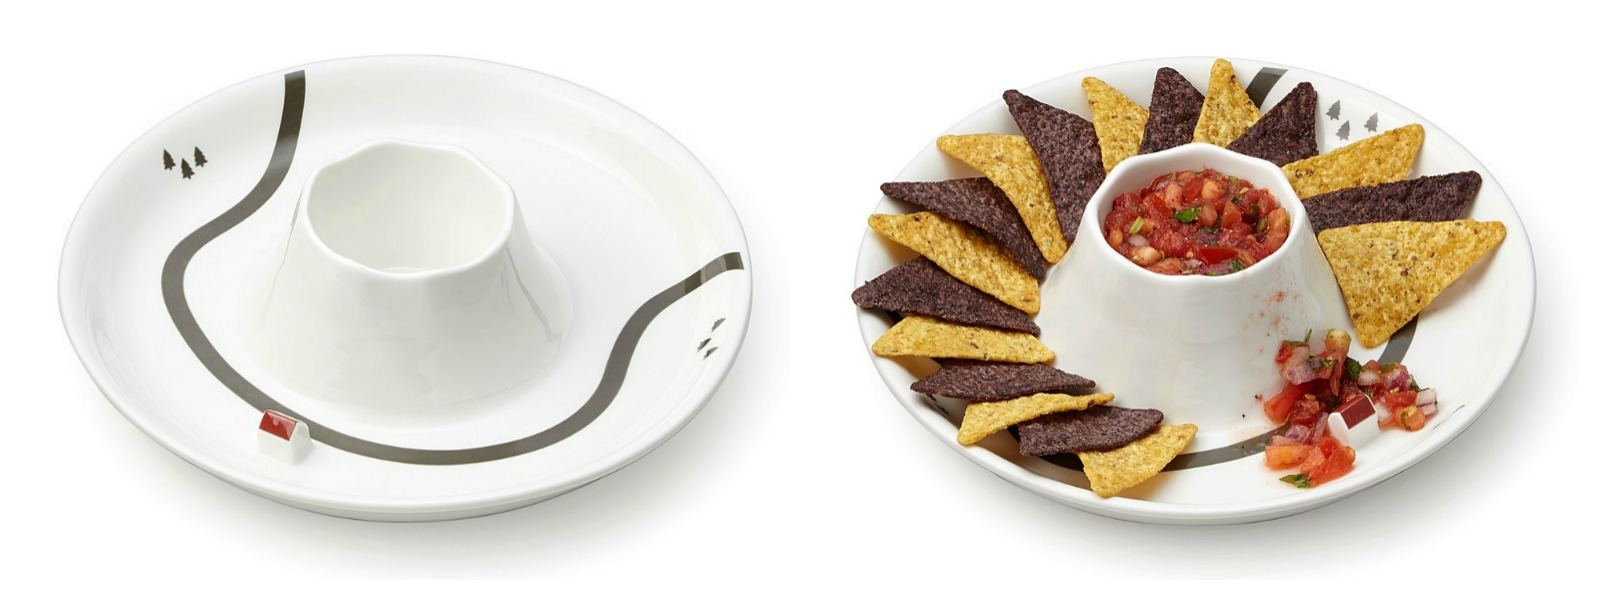 Taste Explosion Dip & Chip Platter | UncommonGoods